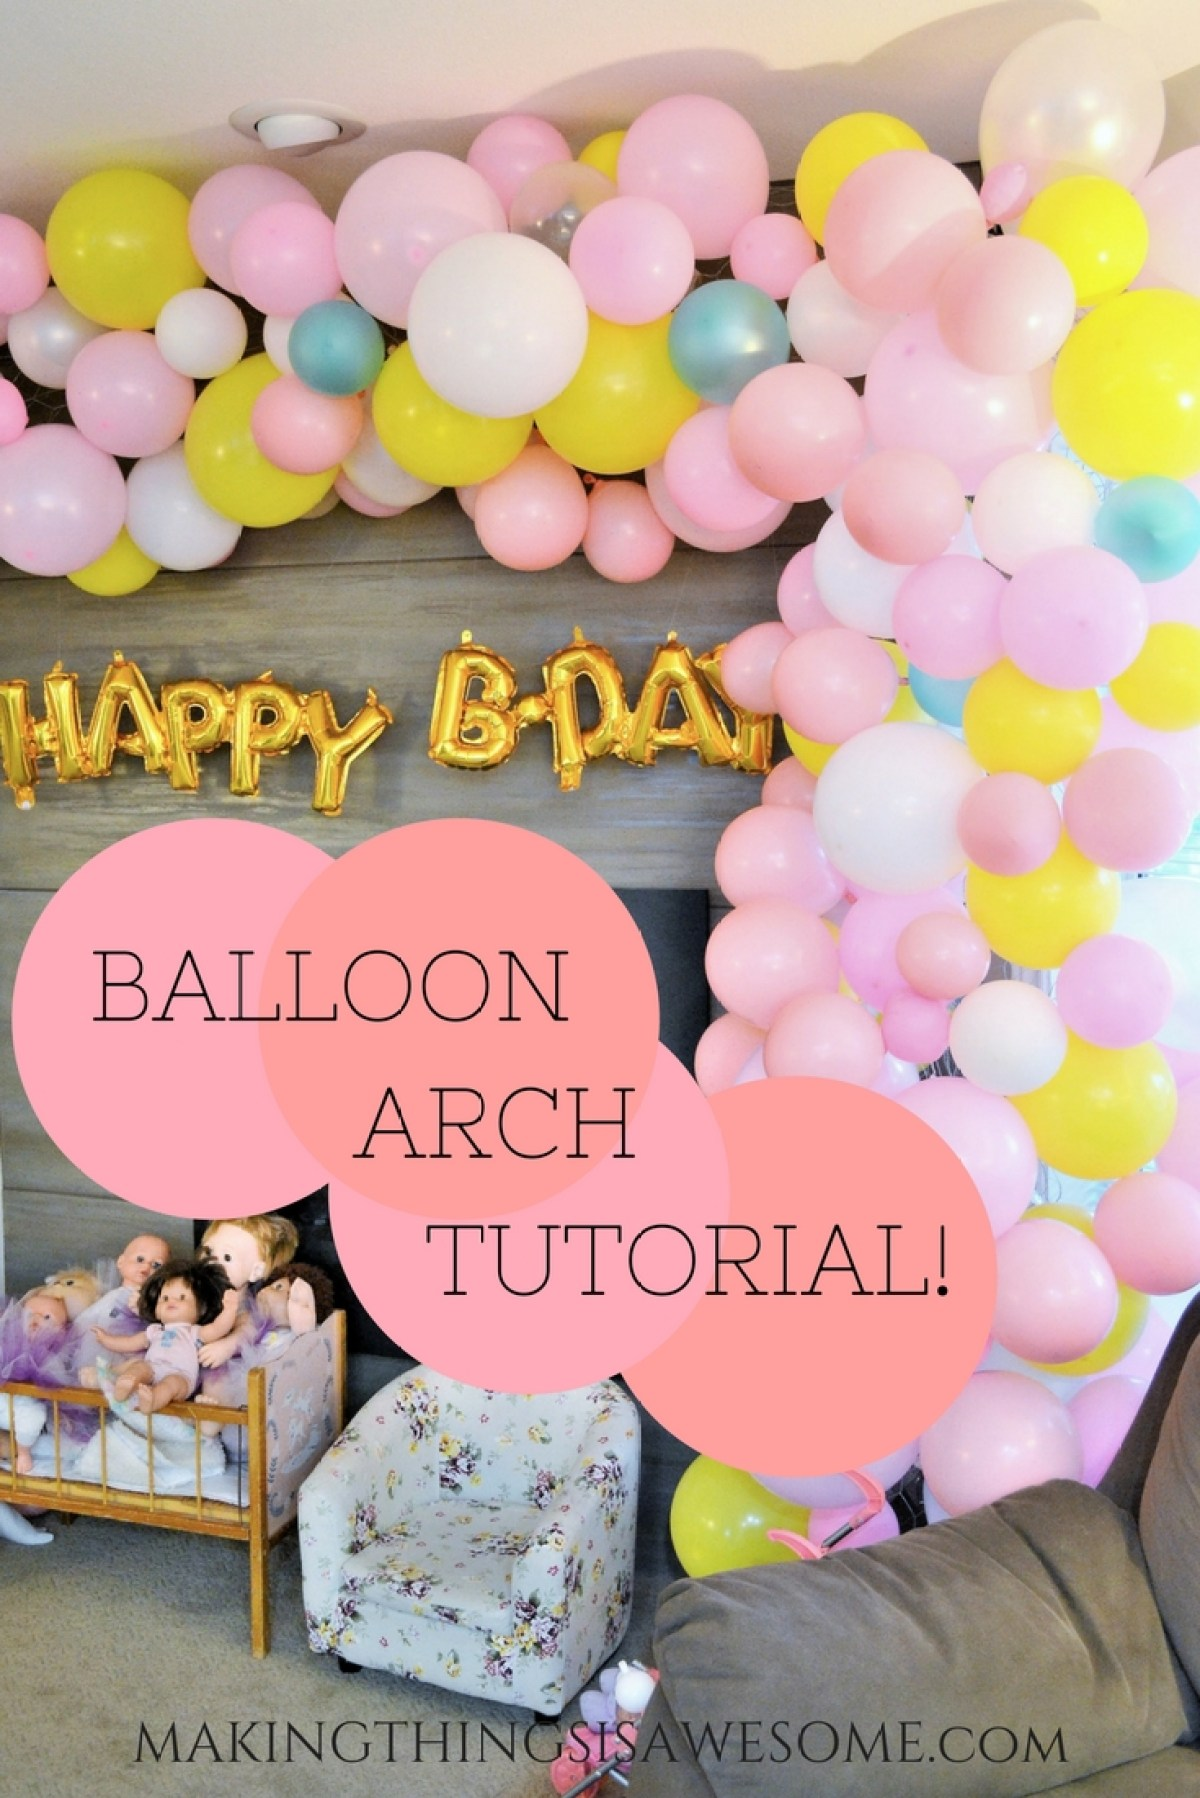 Balloon Arch Tutorial - pin